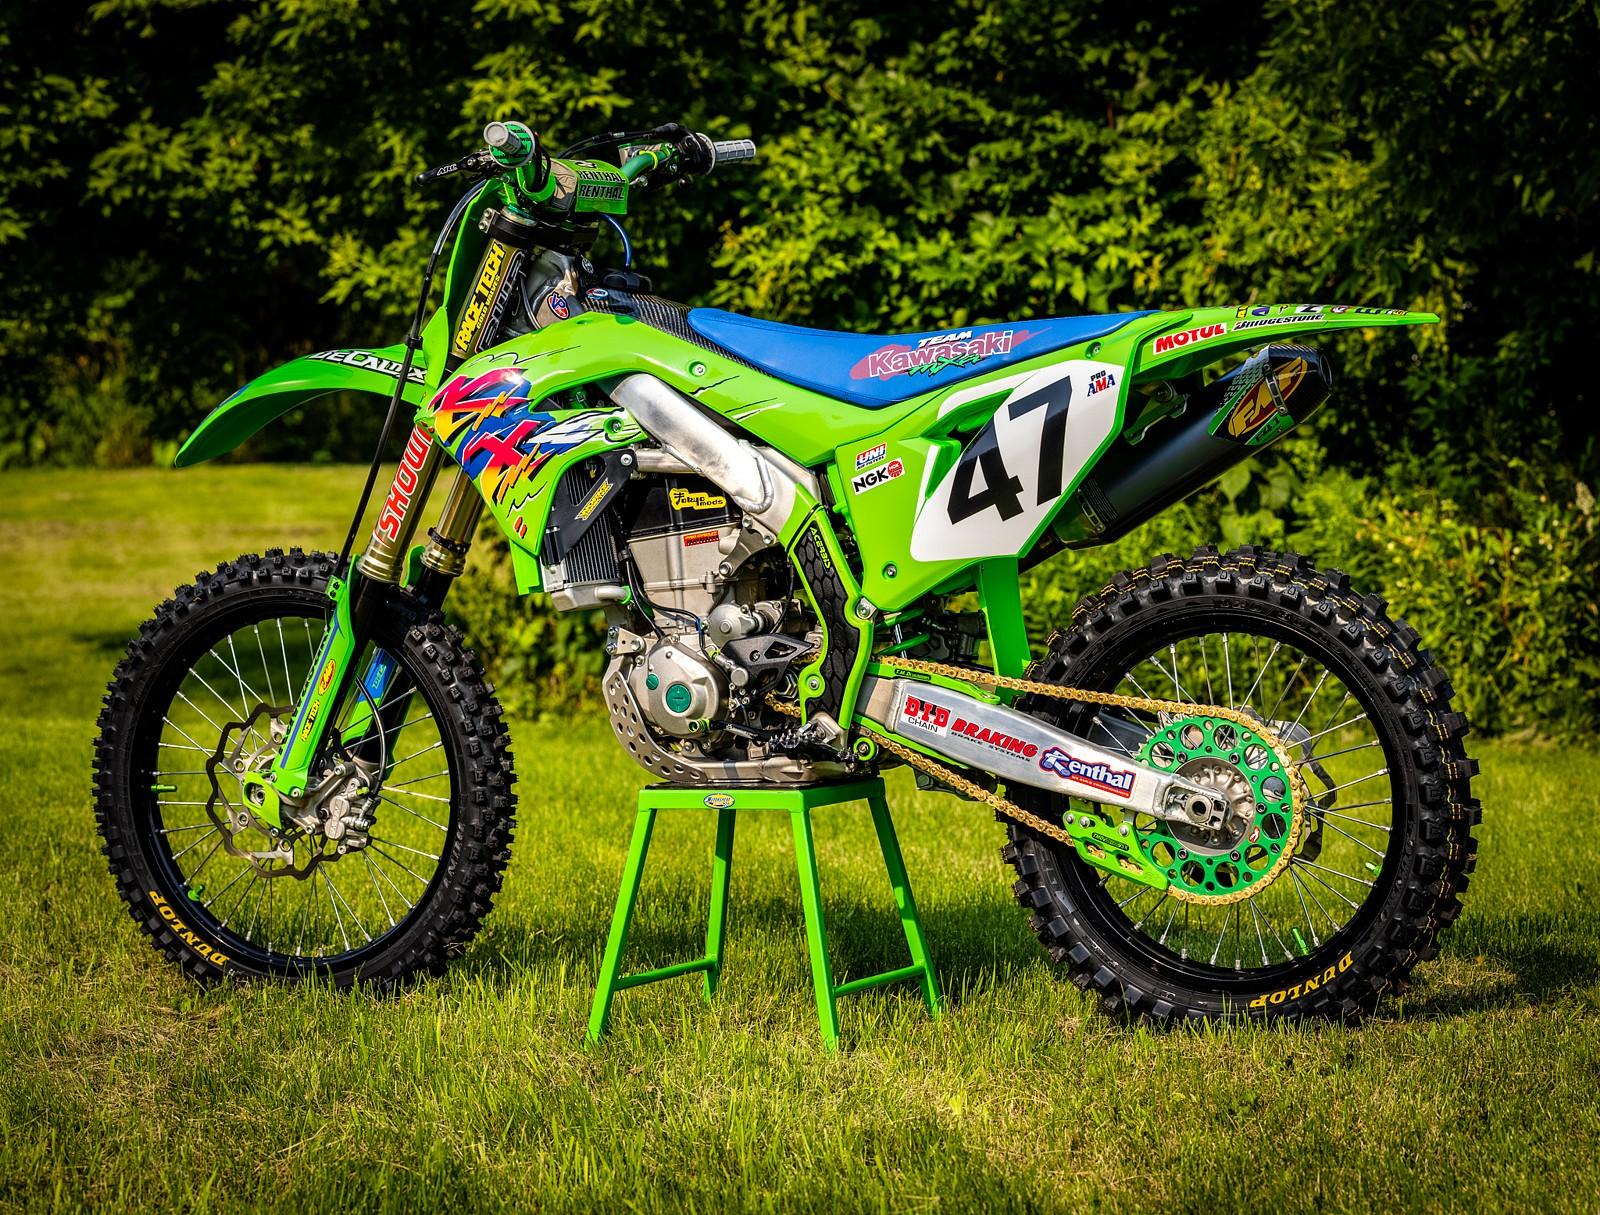 KX450 1993 Retro Graphics - GForce MMG - Motocross Pictures - Vital MX